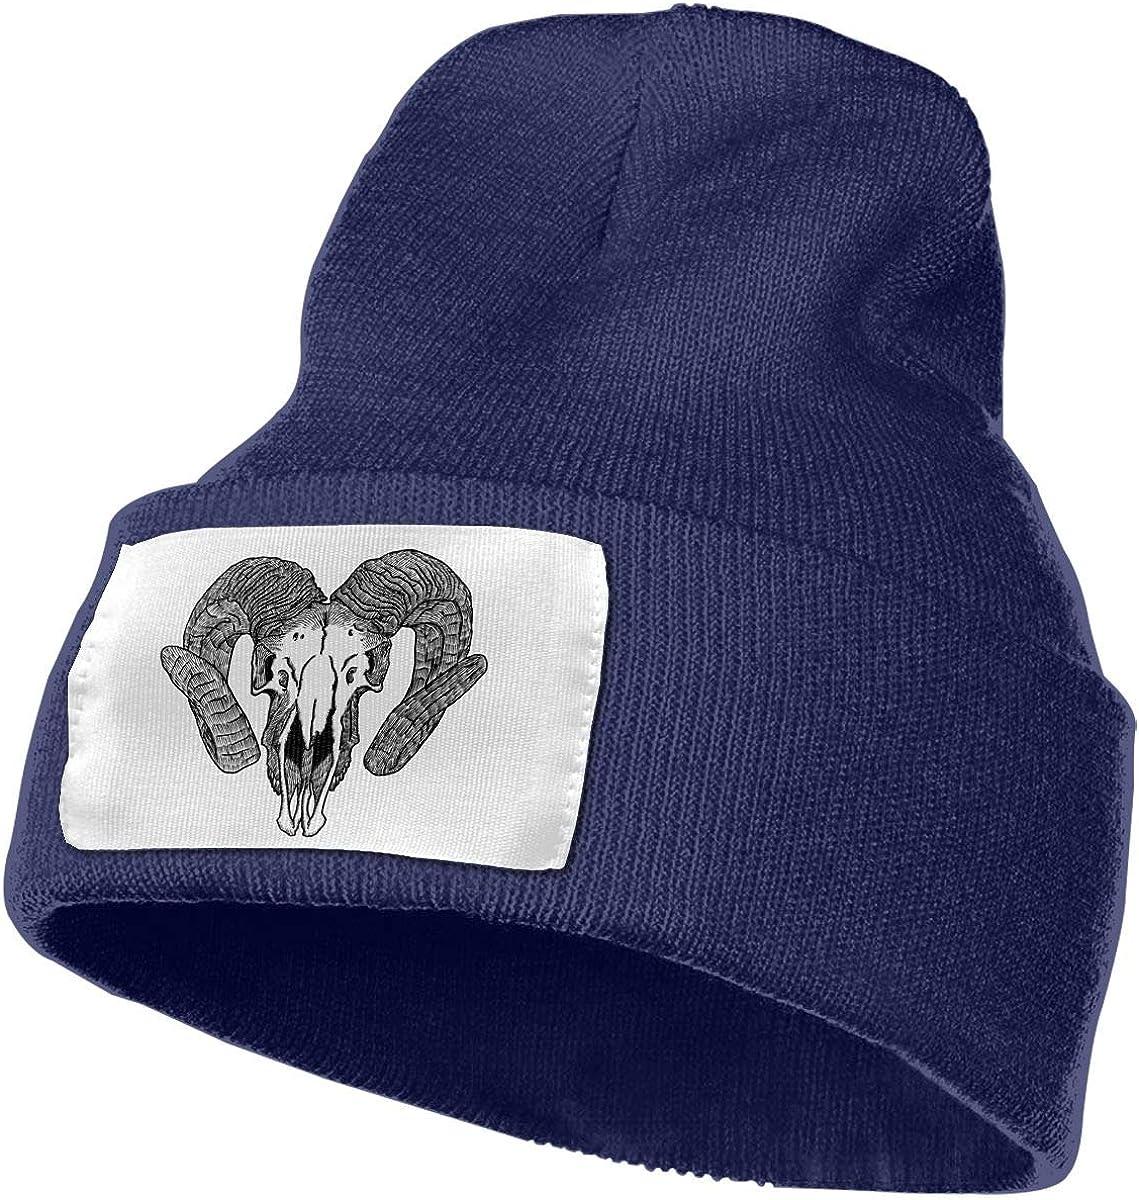 Adults Goat Skull Elastic Knitted Beanie Cap Winter Warm Skull Hats